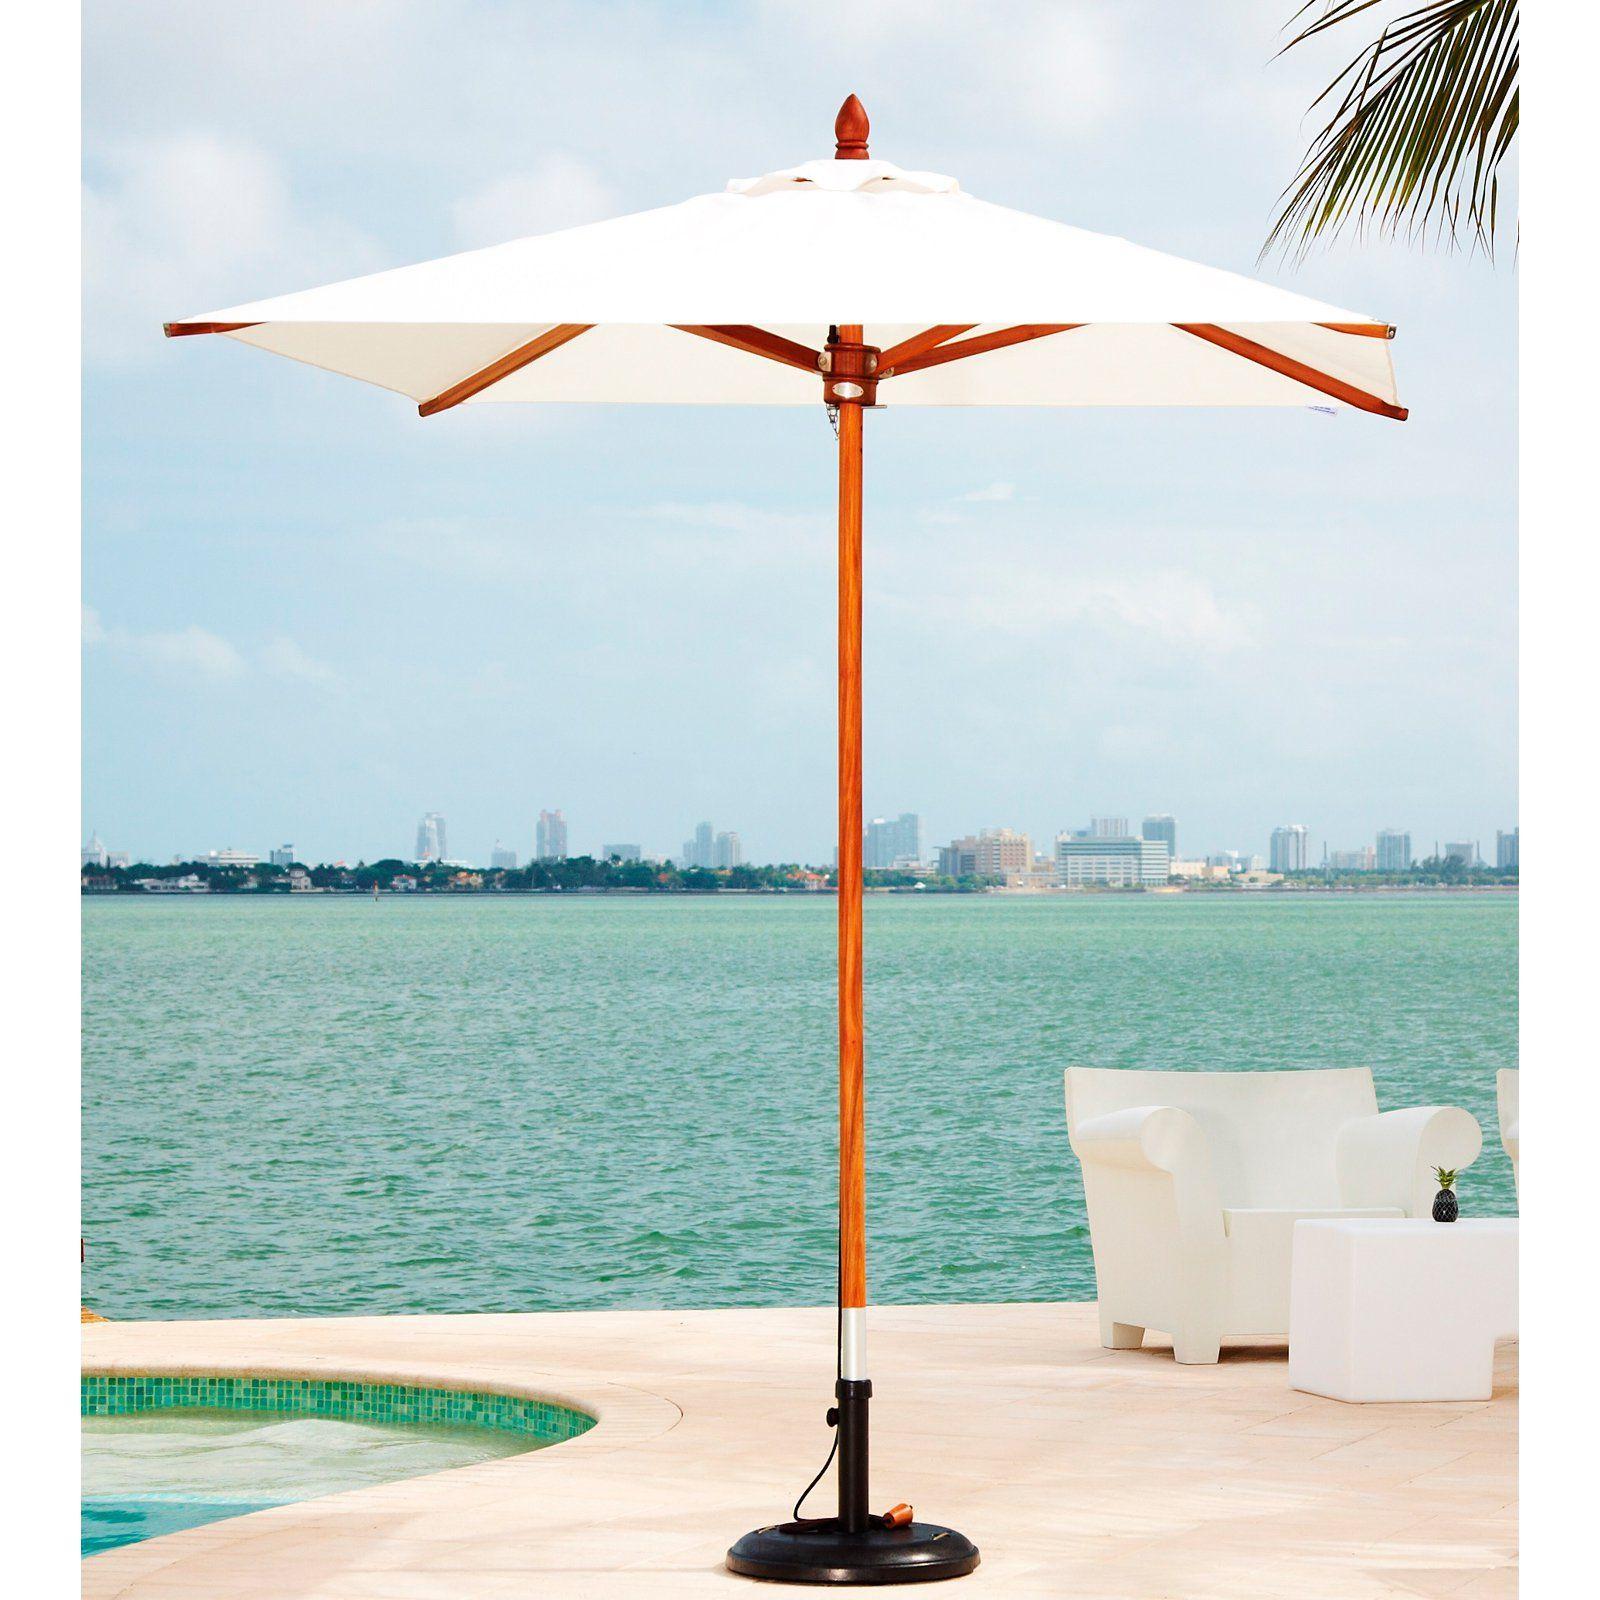 Greencorner 6 5 x 6 5 ft African Mahogany Square Patio Umbrella